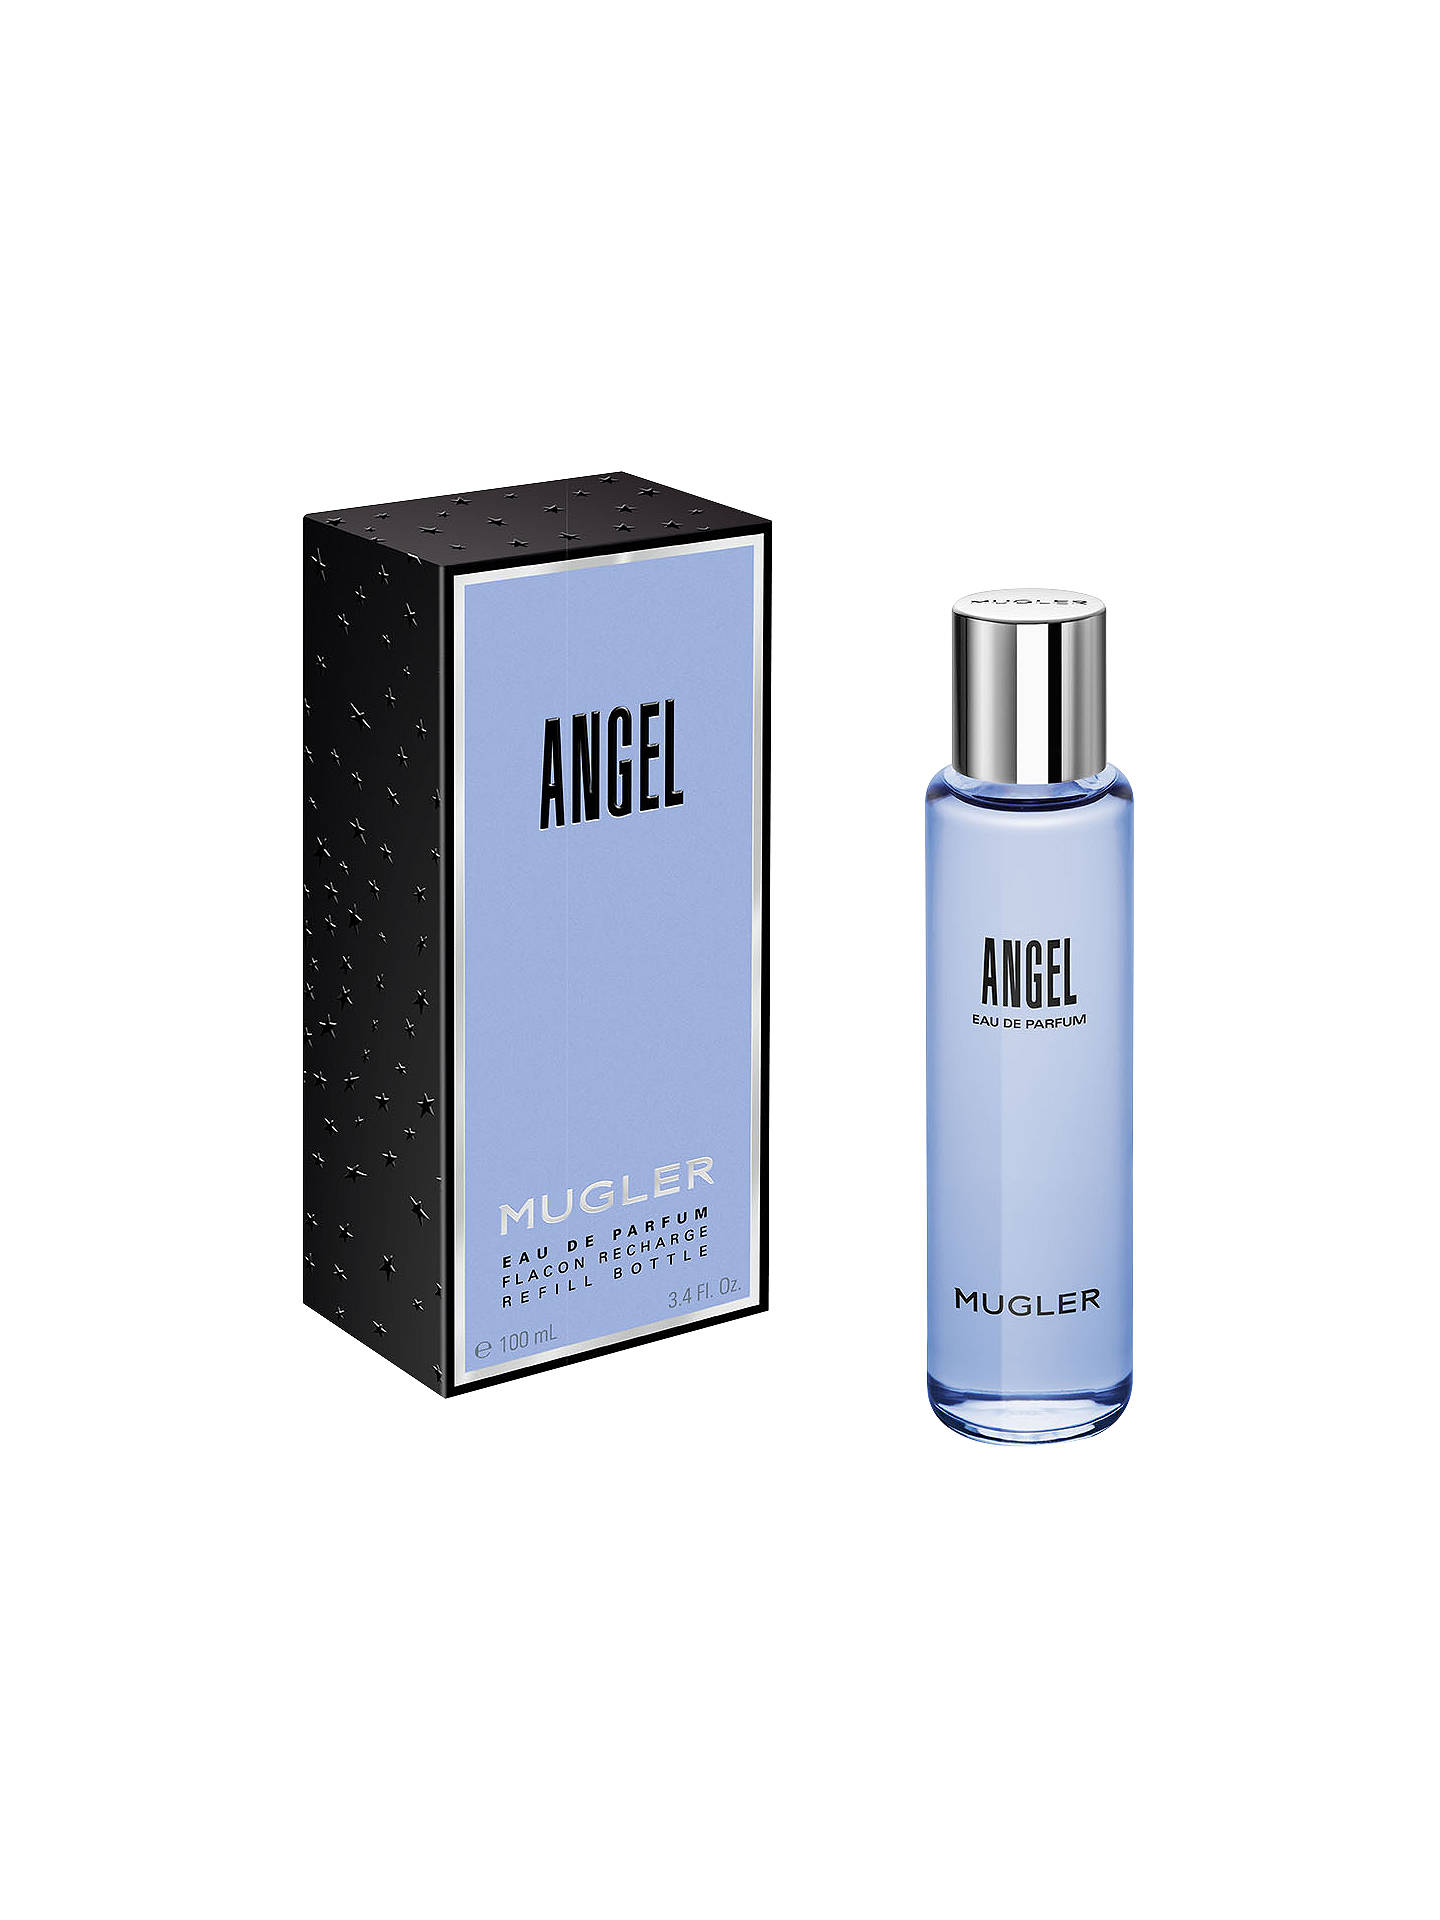 Mugler Angel Eau De Parfum Eco Refill Bottle 100ml At John Lewis